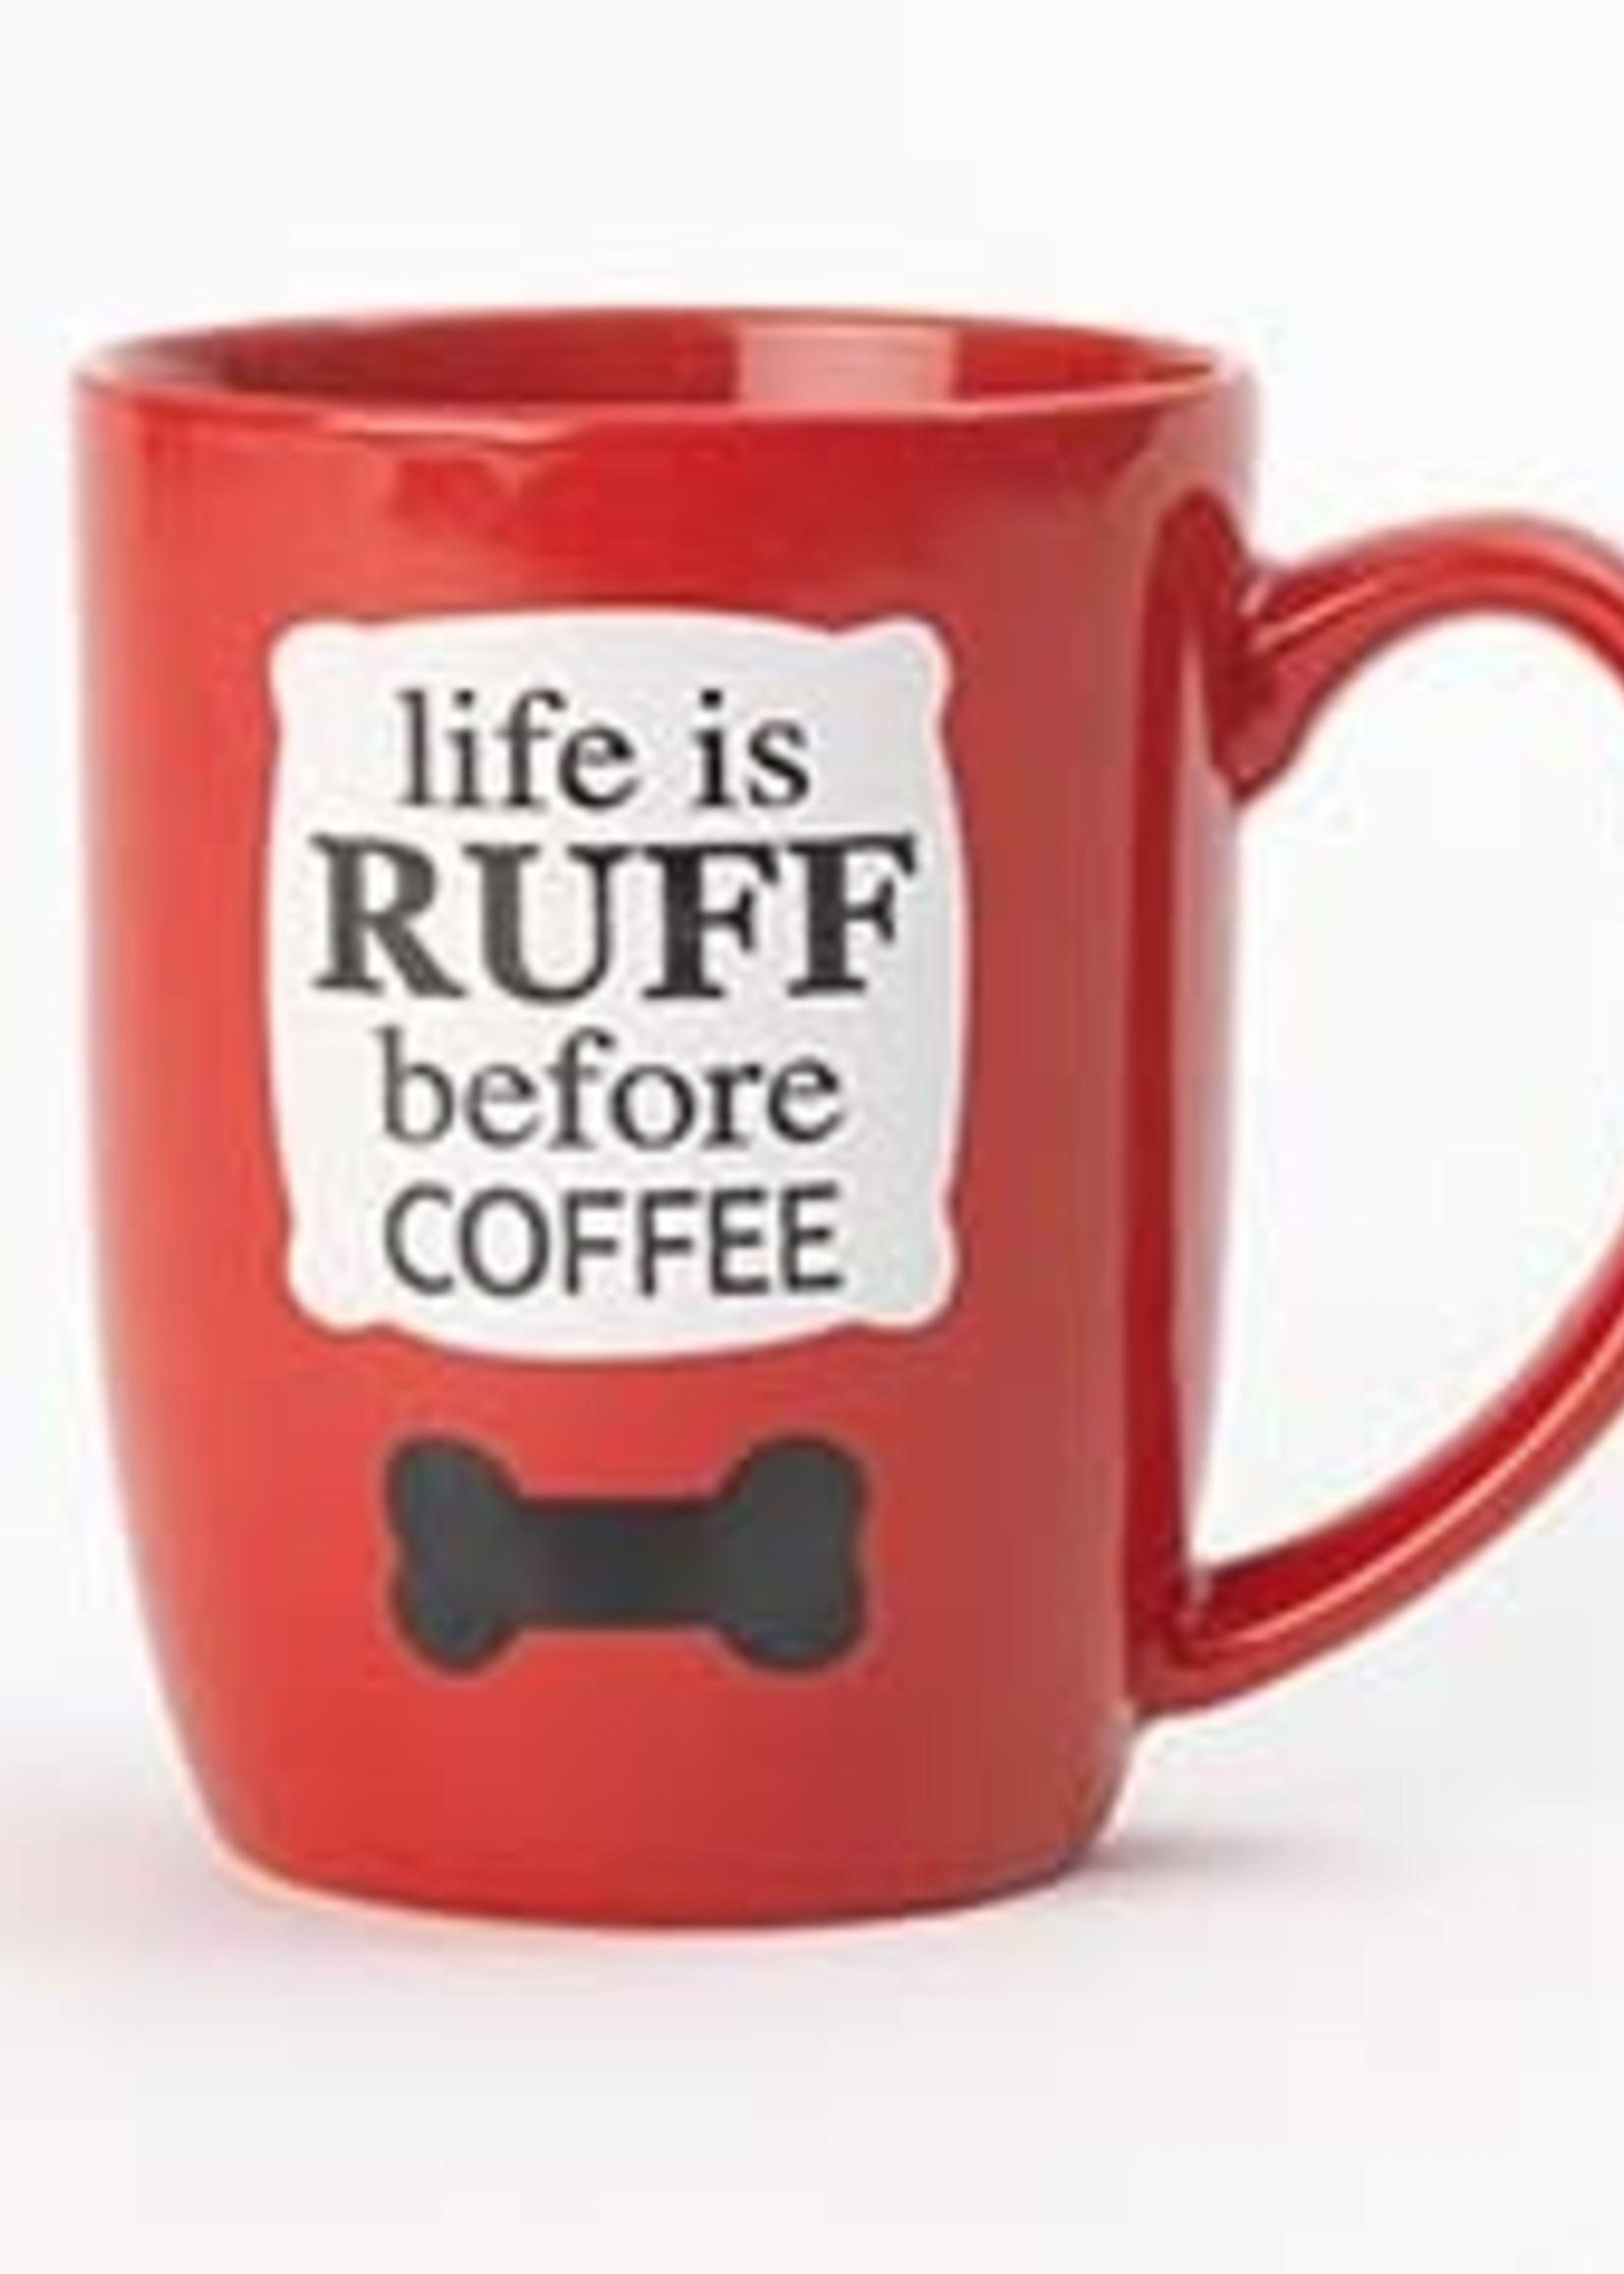 petrageous Petrageous Life is Ruff Before Coffee Mug 24oz